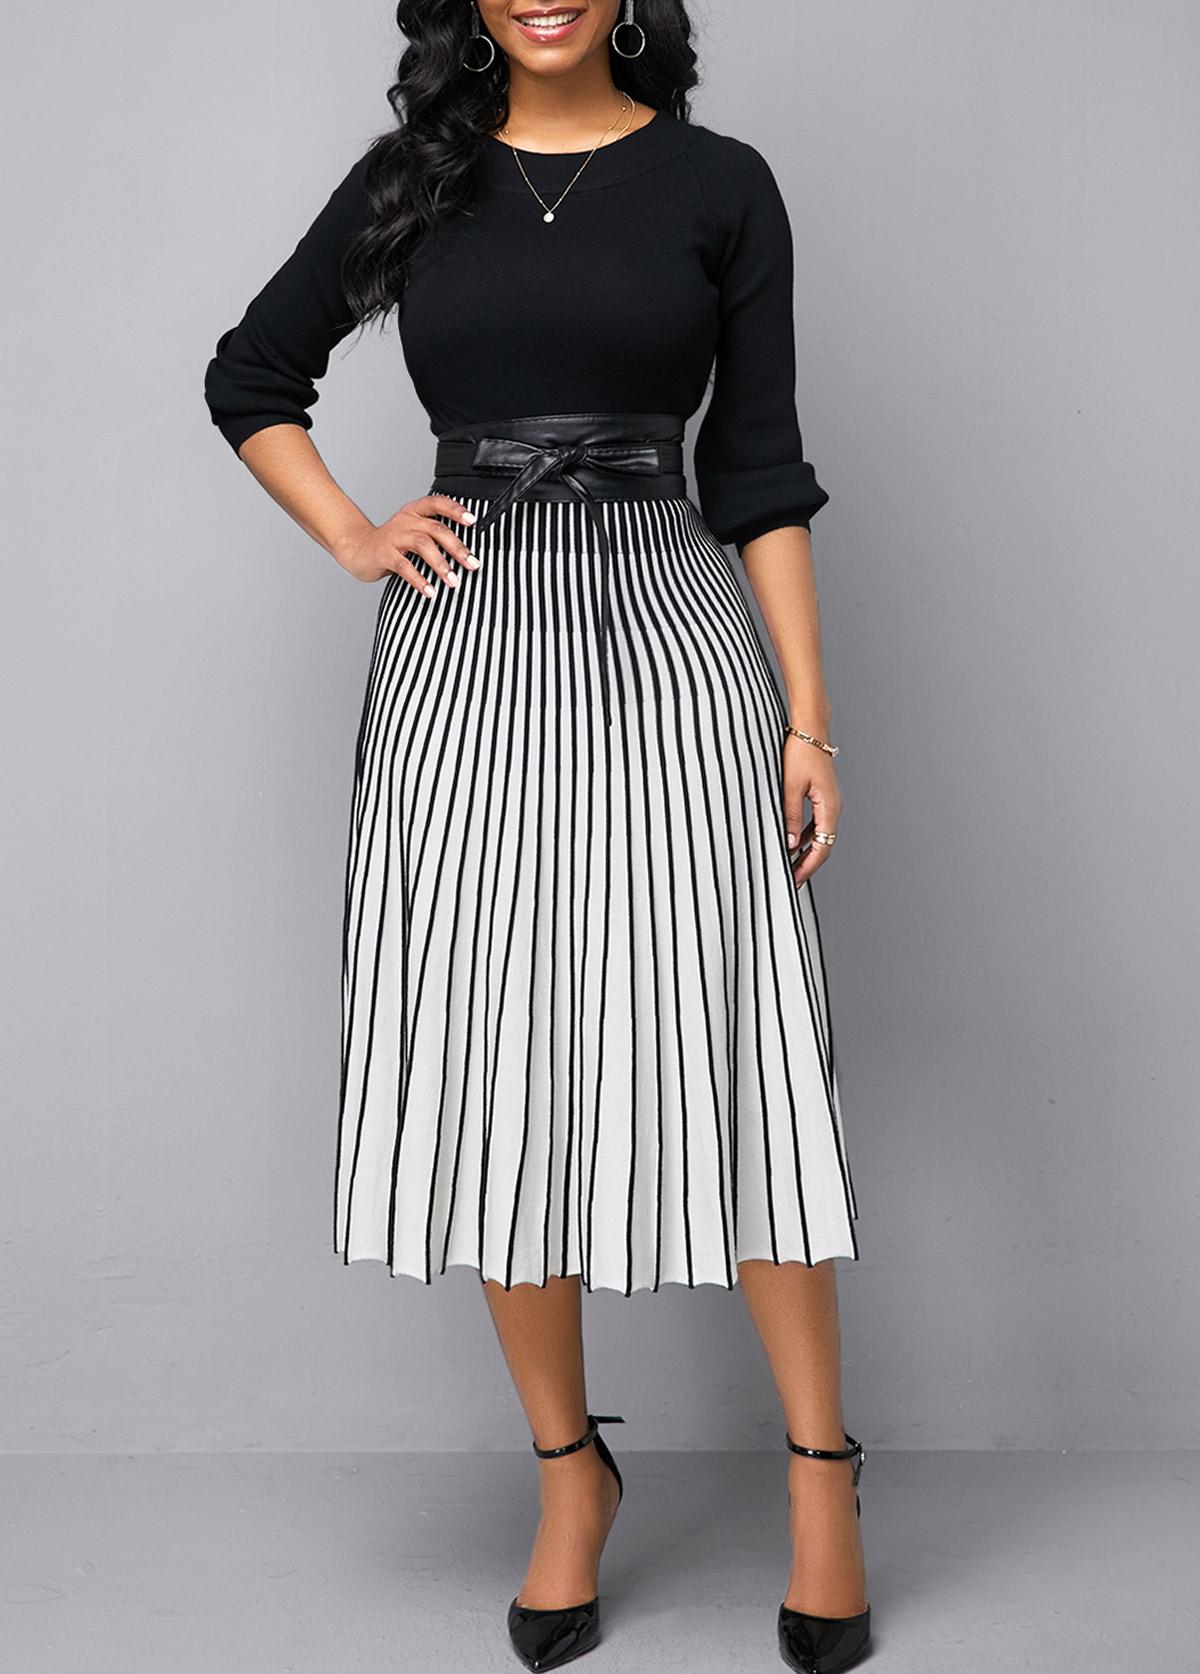 Vertical Striped Round Neck Sweater Dress